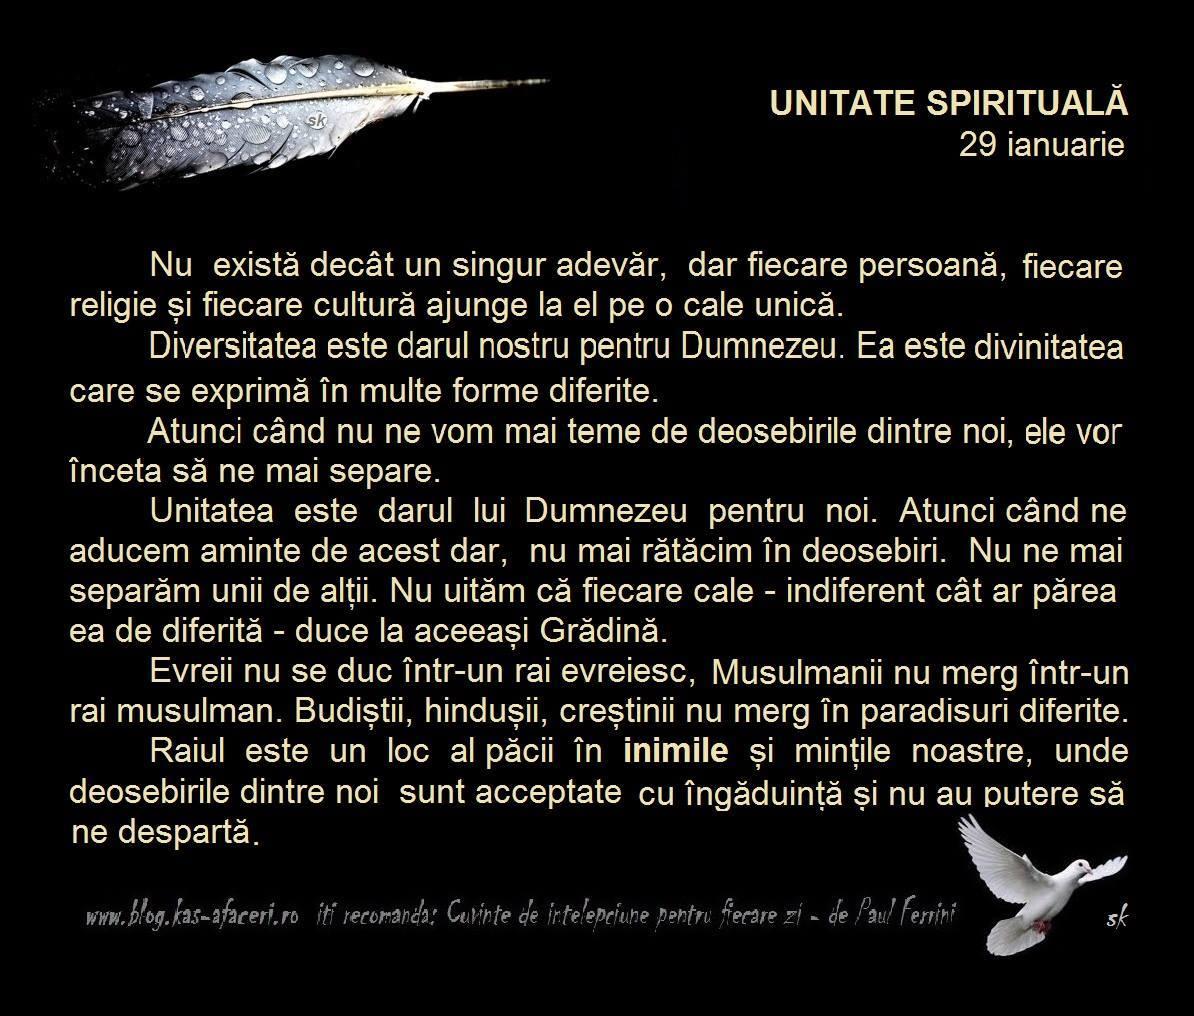 unitate spirituala